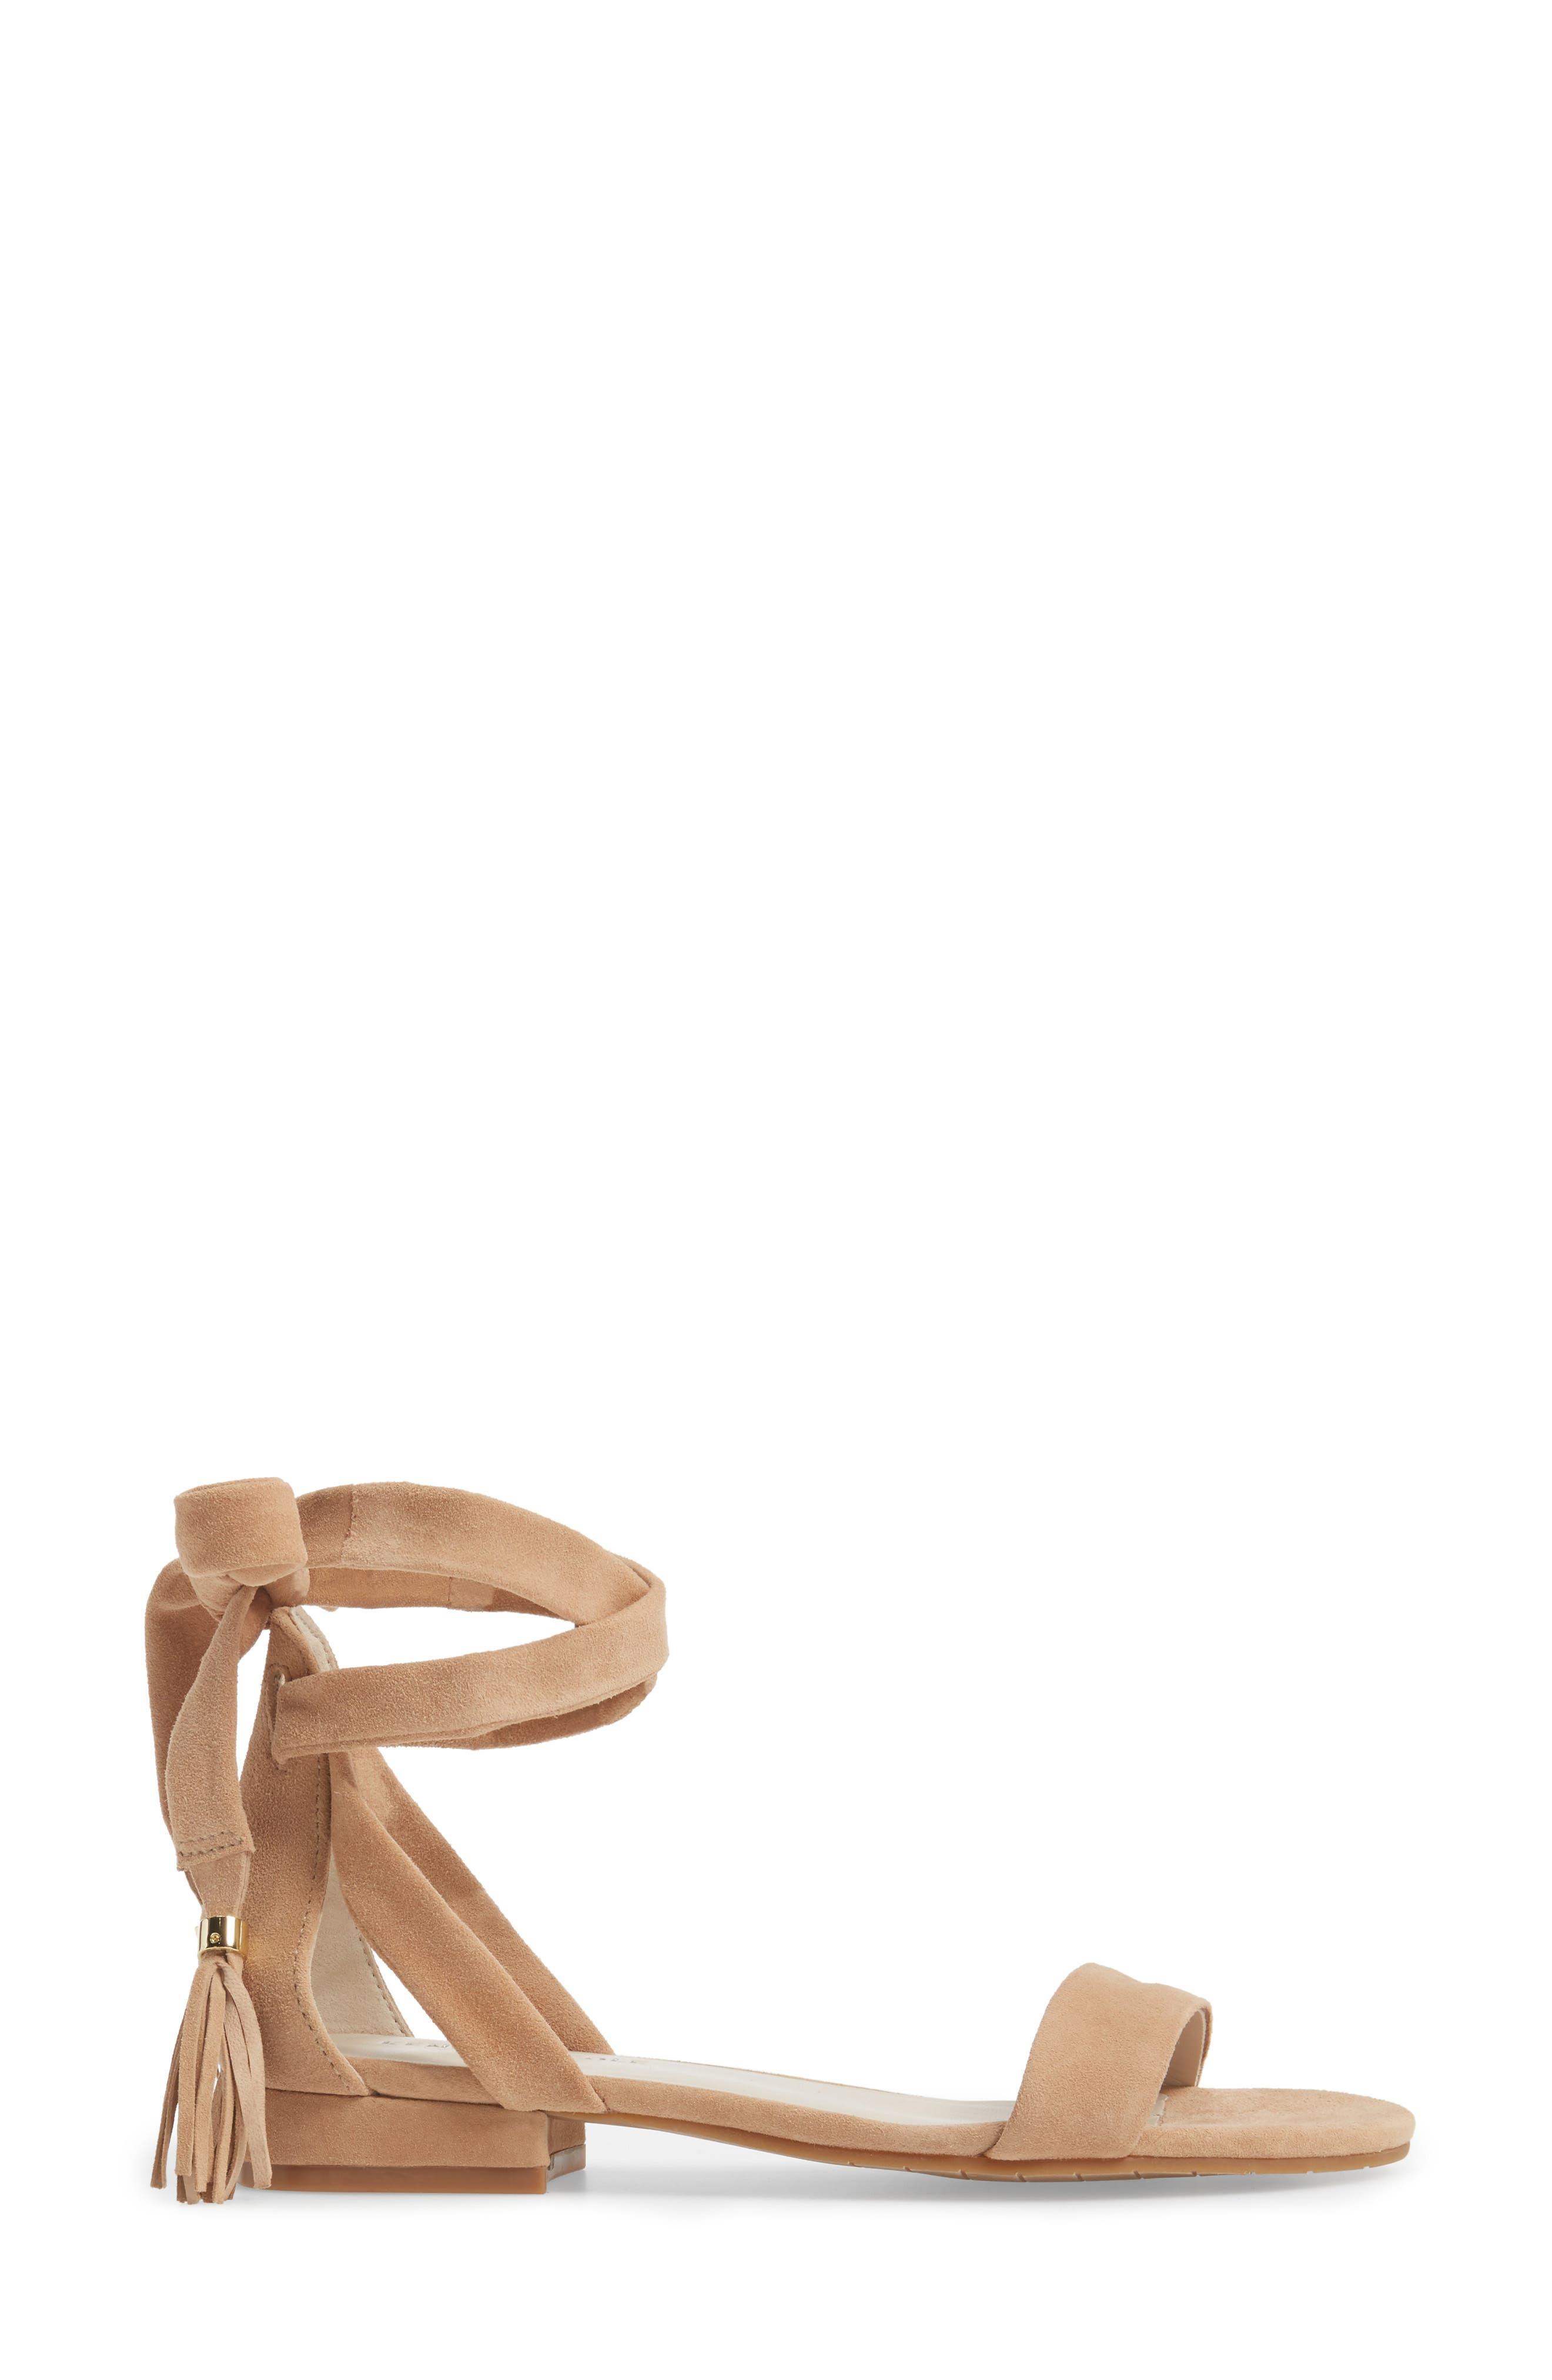 Valen Tassel Lace-Up Sandal,                             Alternate thumbnail 34, color,